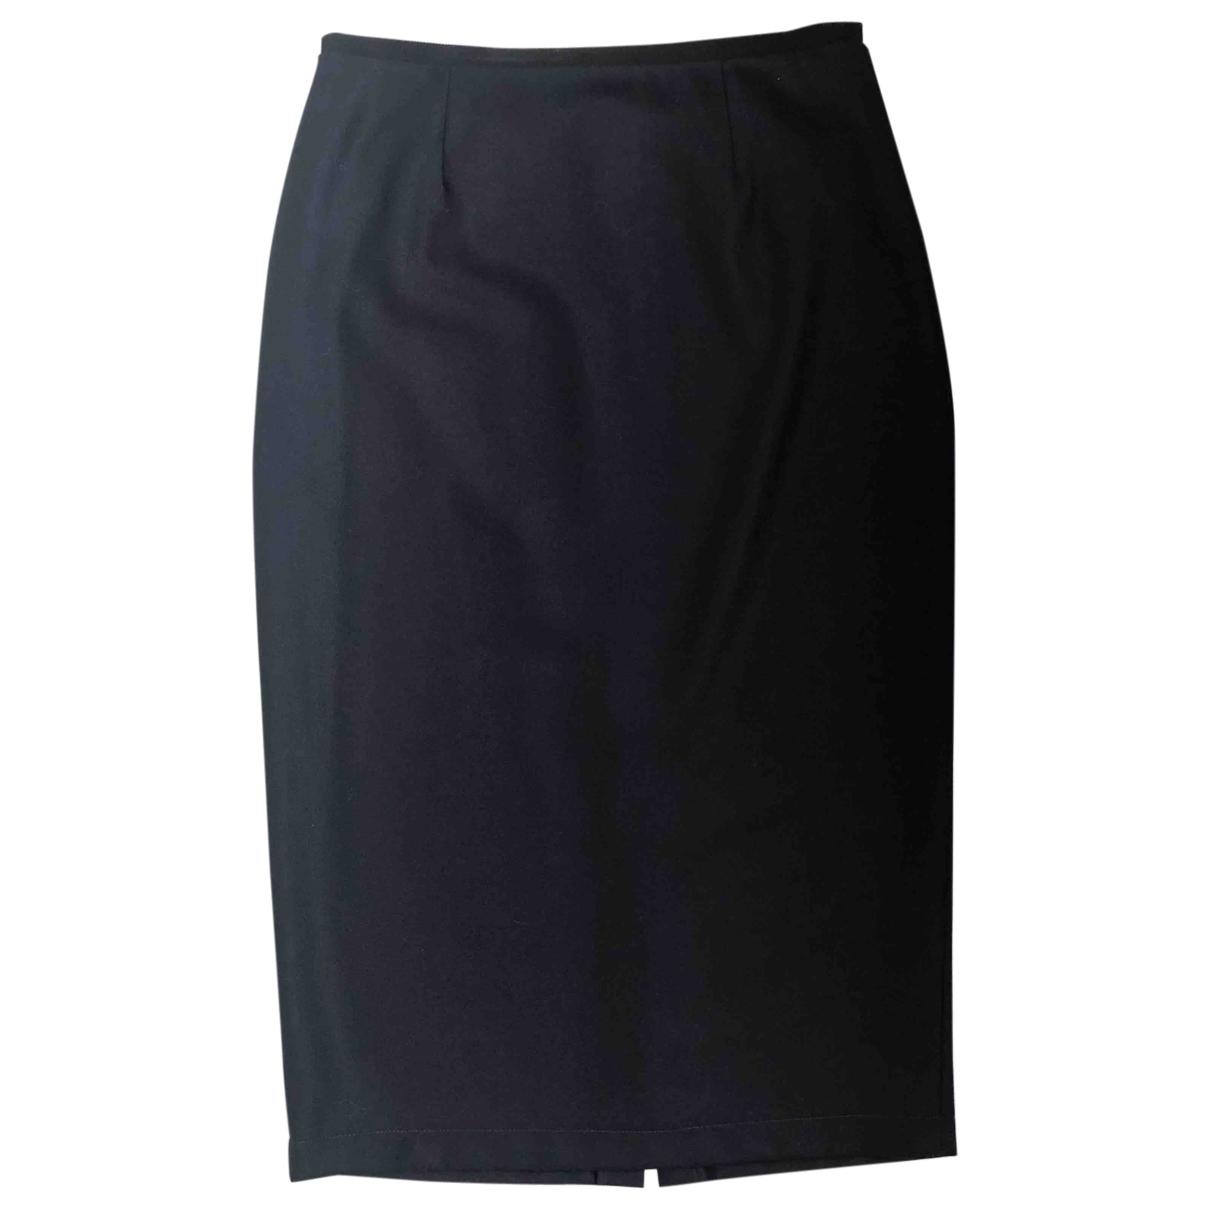 Rue Blanche \N Blue Wool skirt for Women 2 0-5